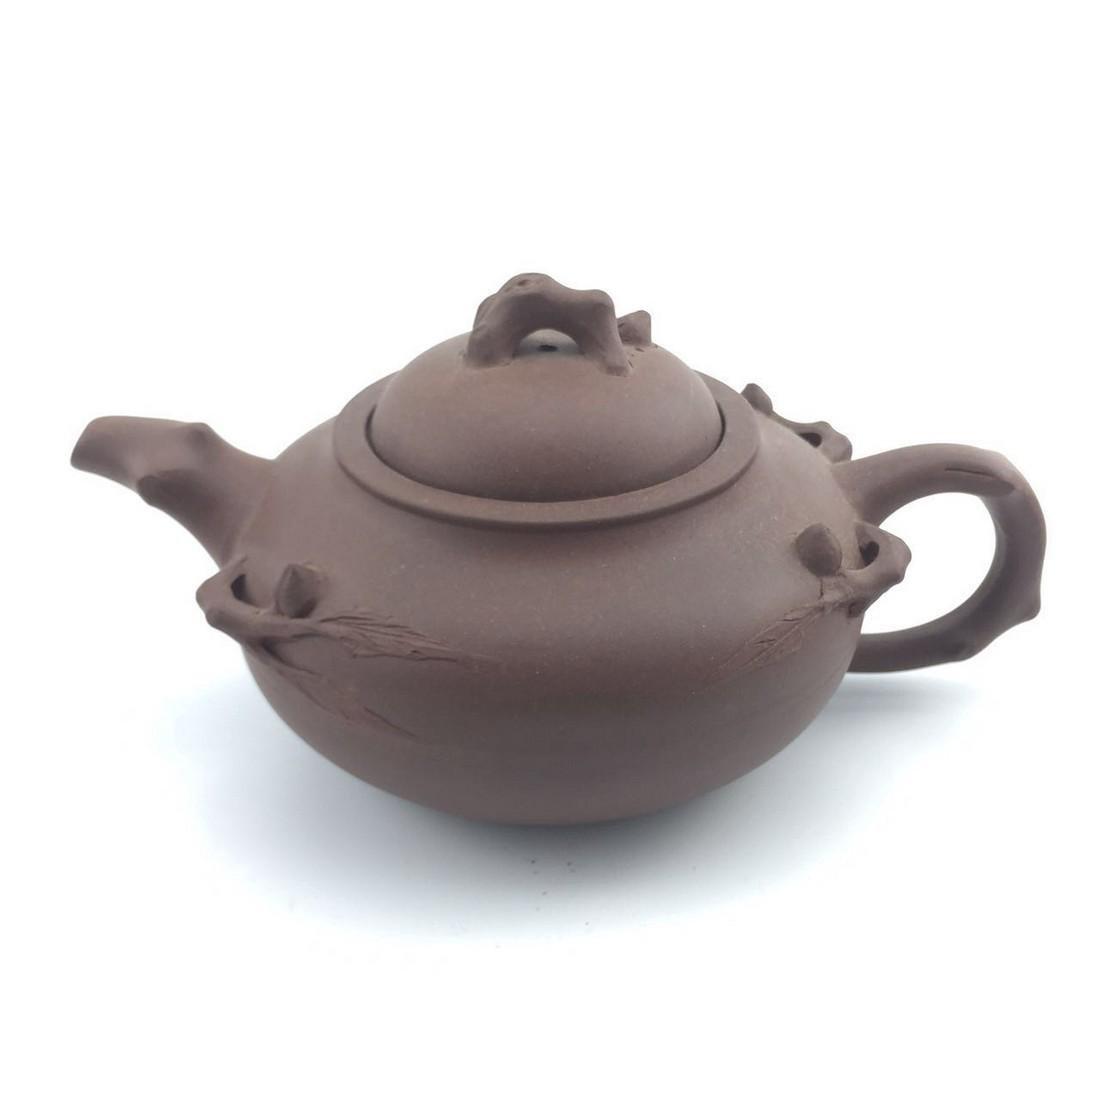 Antique Chinese ZI-SHA TeaPot